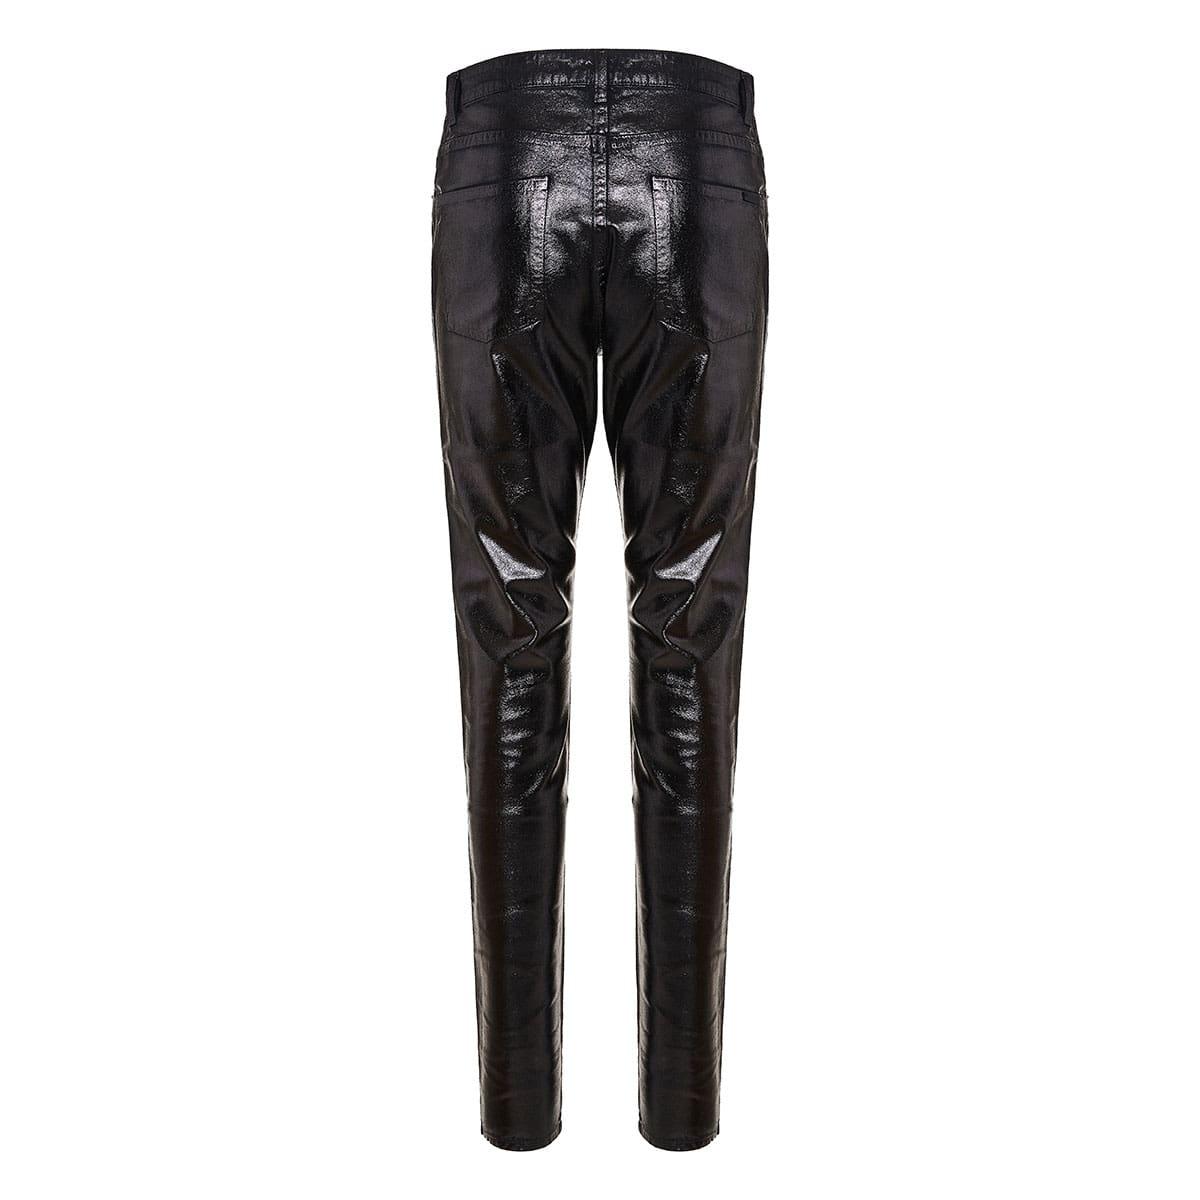 Vinyl-effect skinny jeans